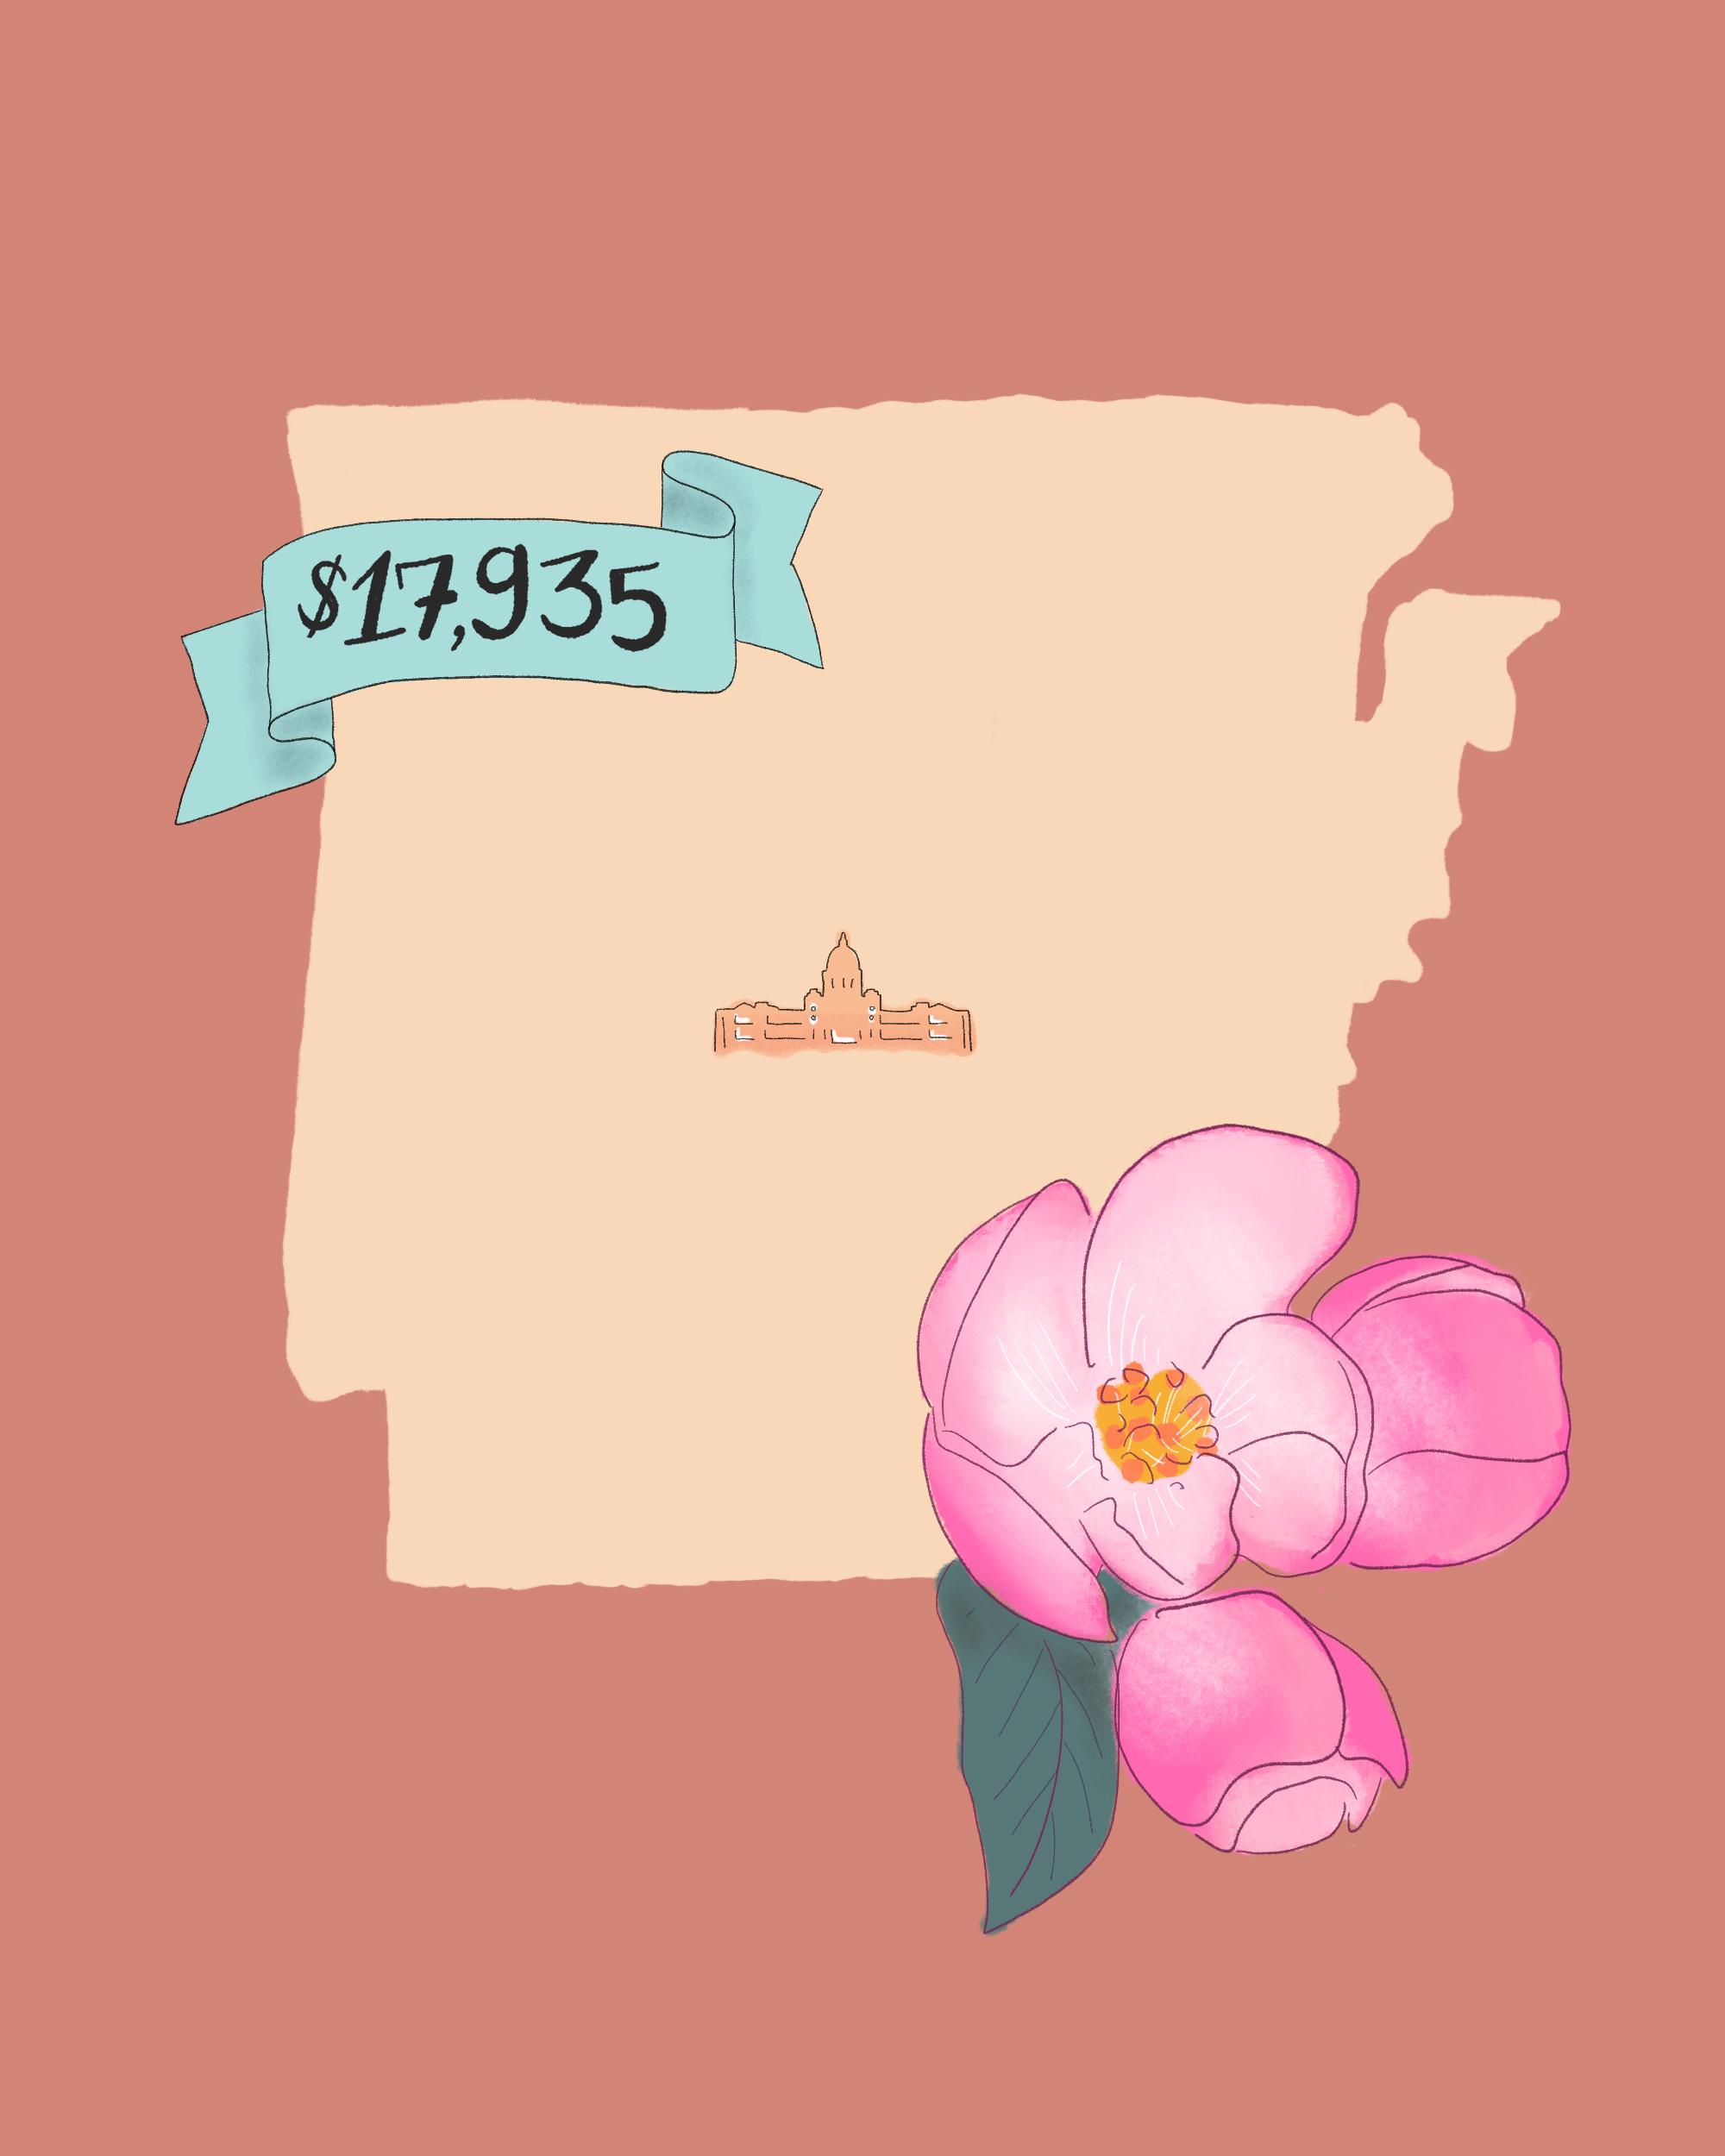 state wedding costs illustration arkansas